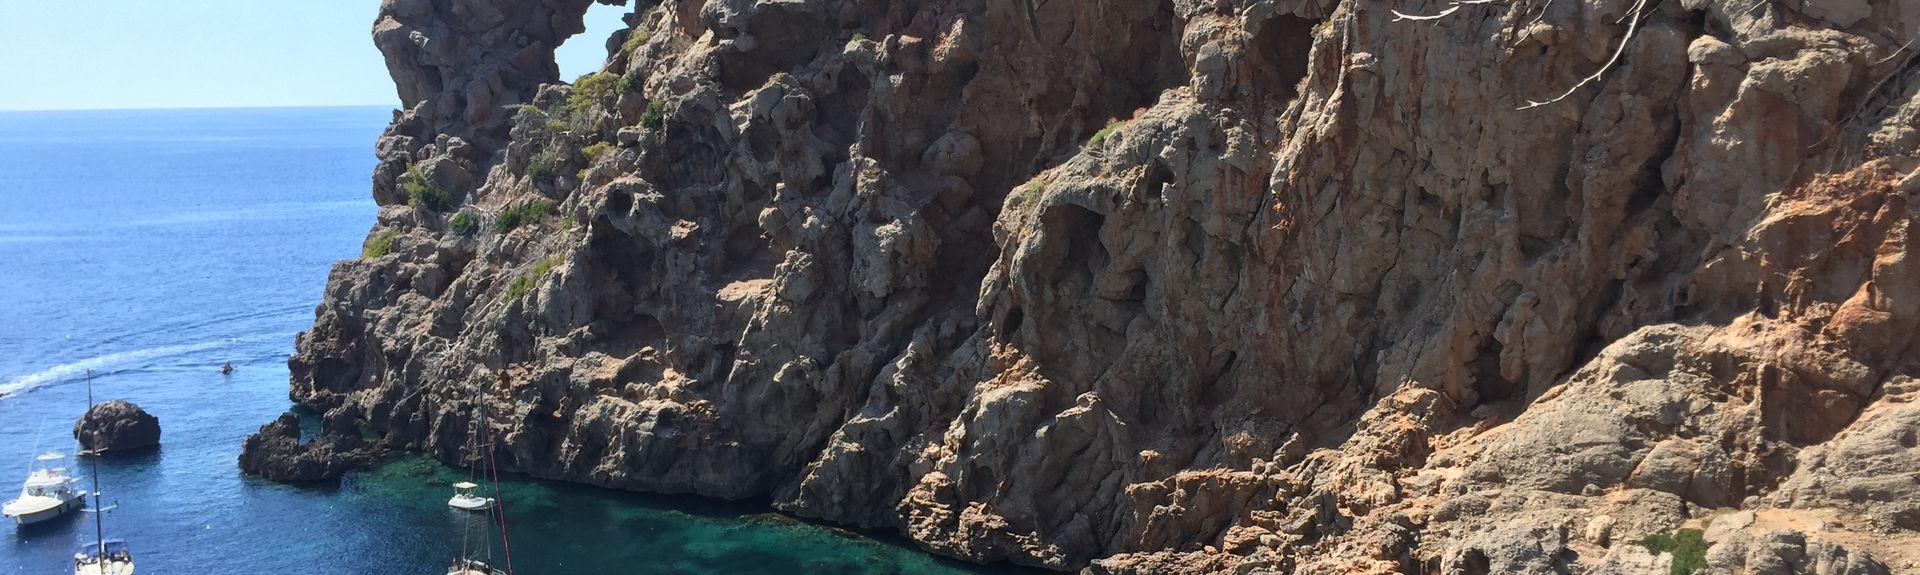 Bunyola, Balearic Islands, Spain